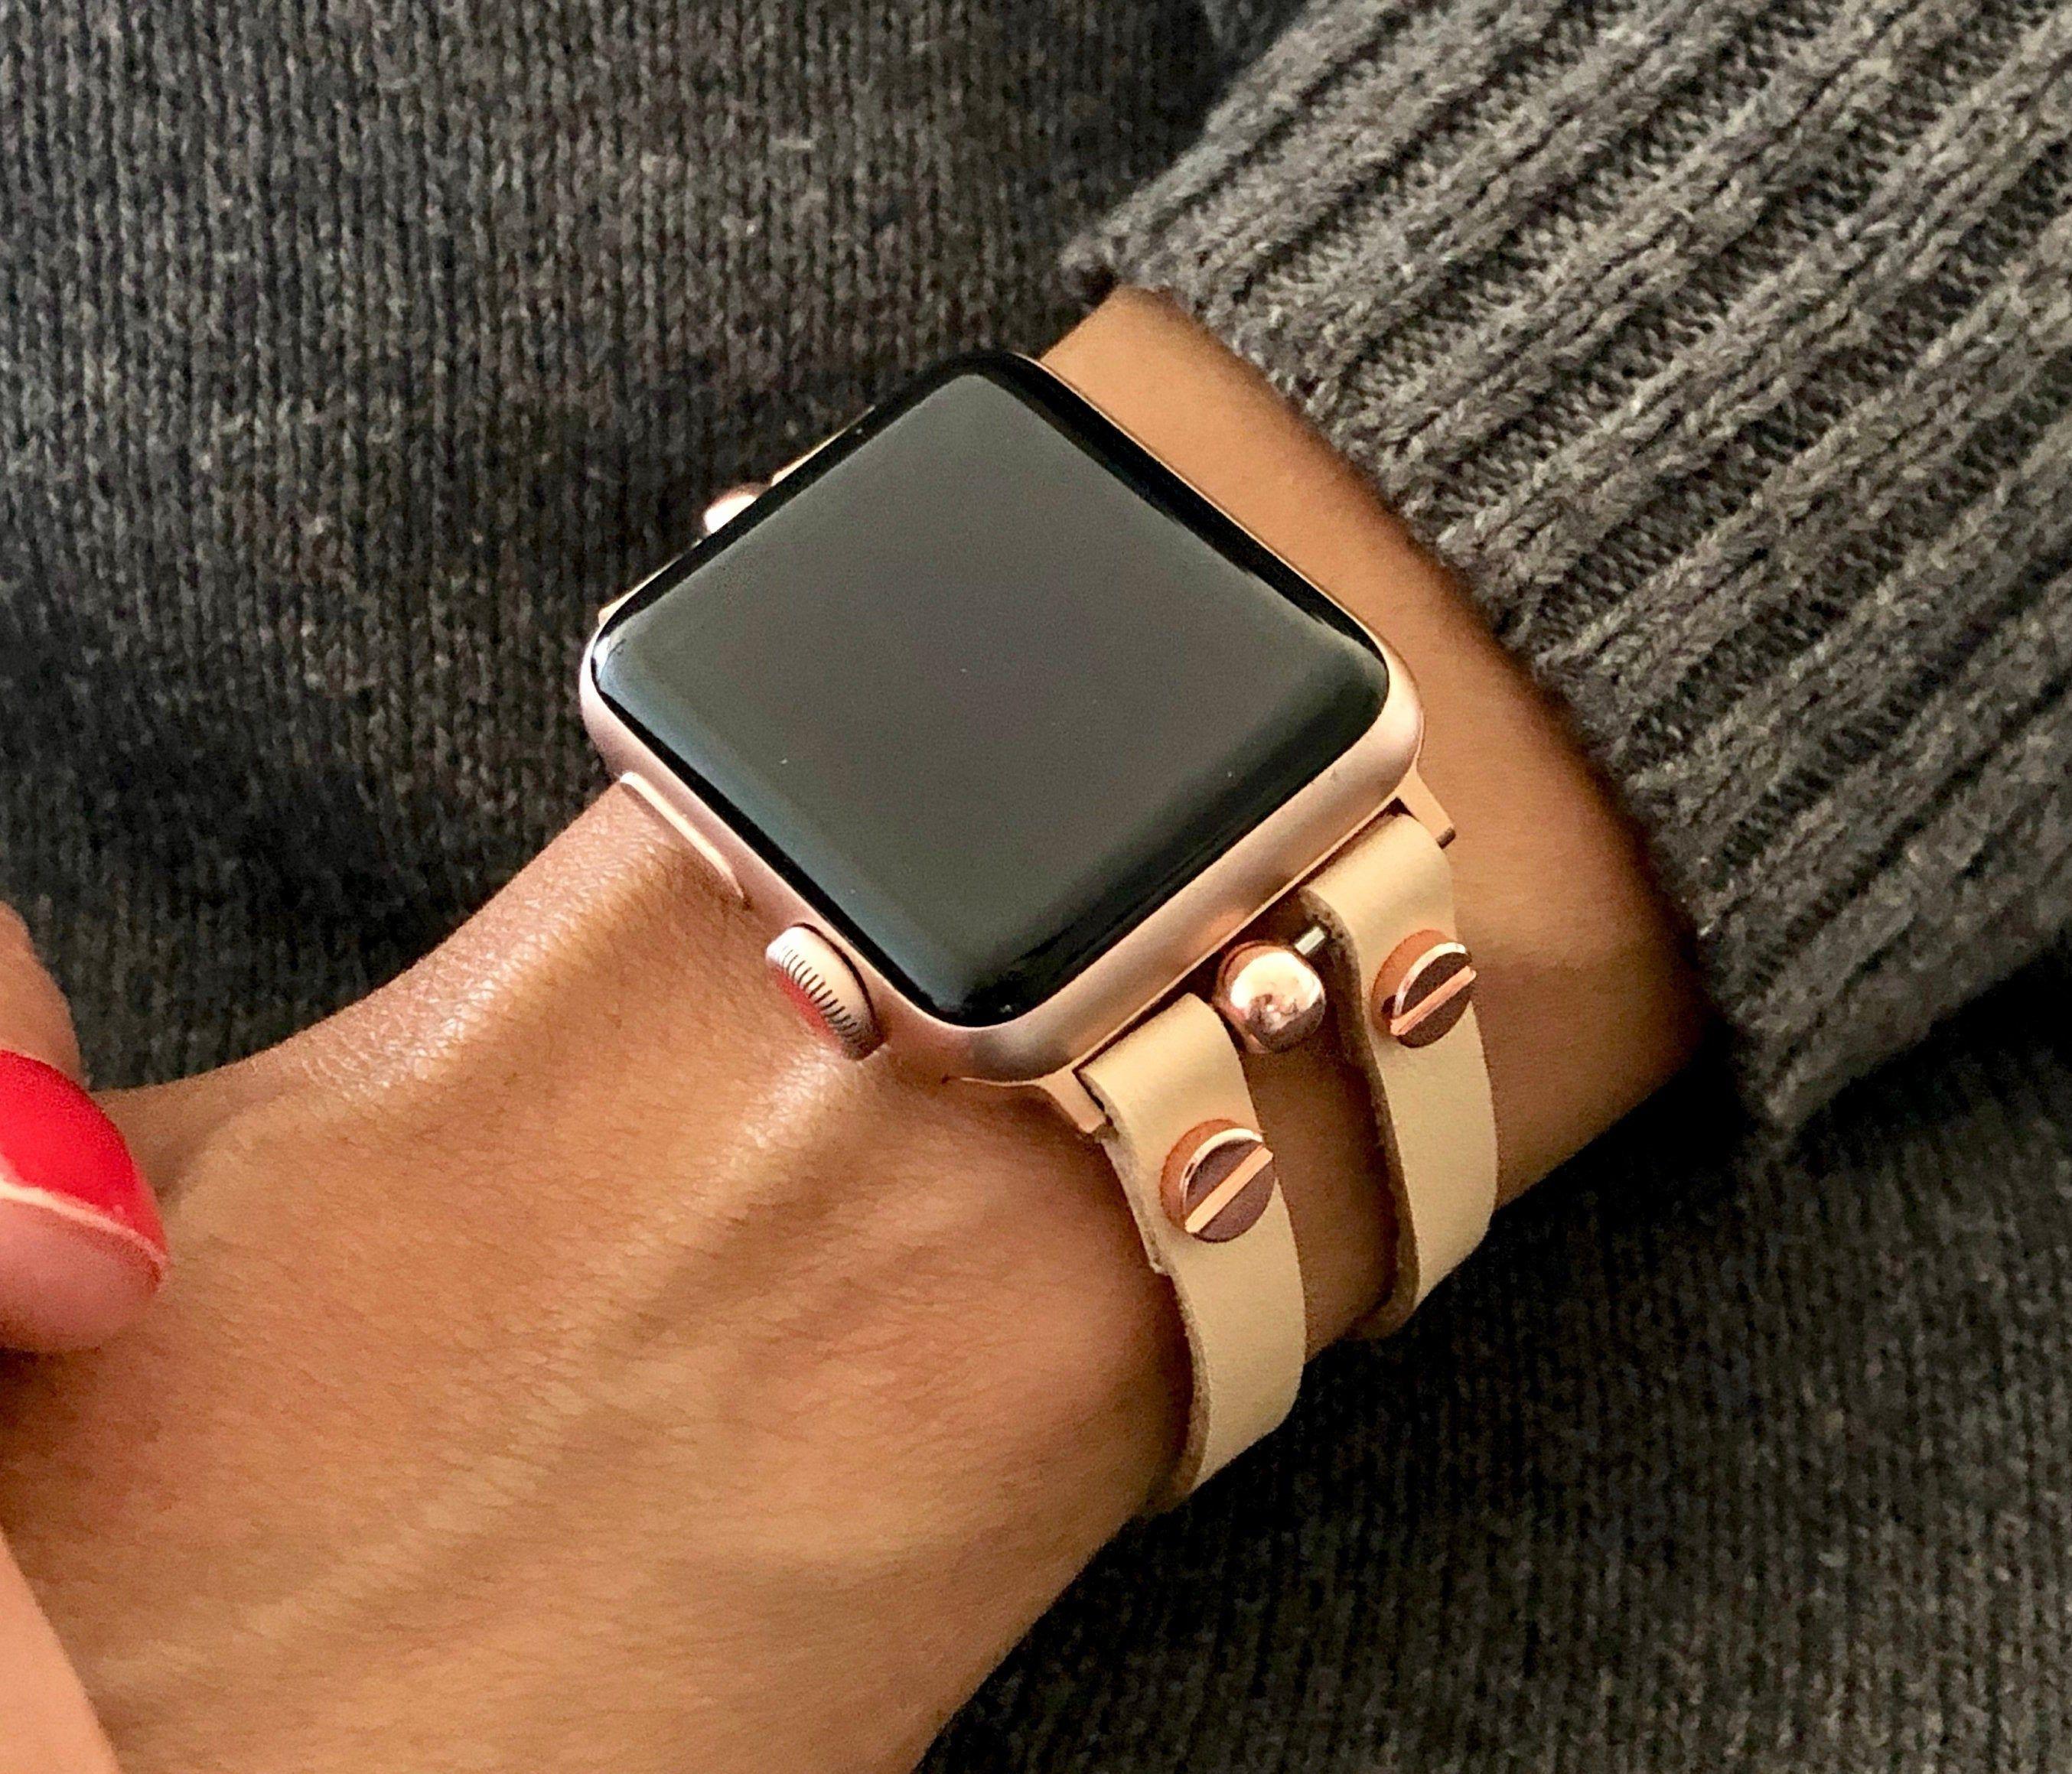 Vegan Leather Apple Watch Bracelet Cream Color Rose Gold Etsy Apple Watch Bands Women Rose Gold Apple Watch Apple Watch Fashion